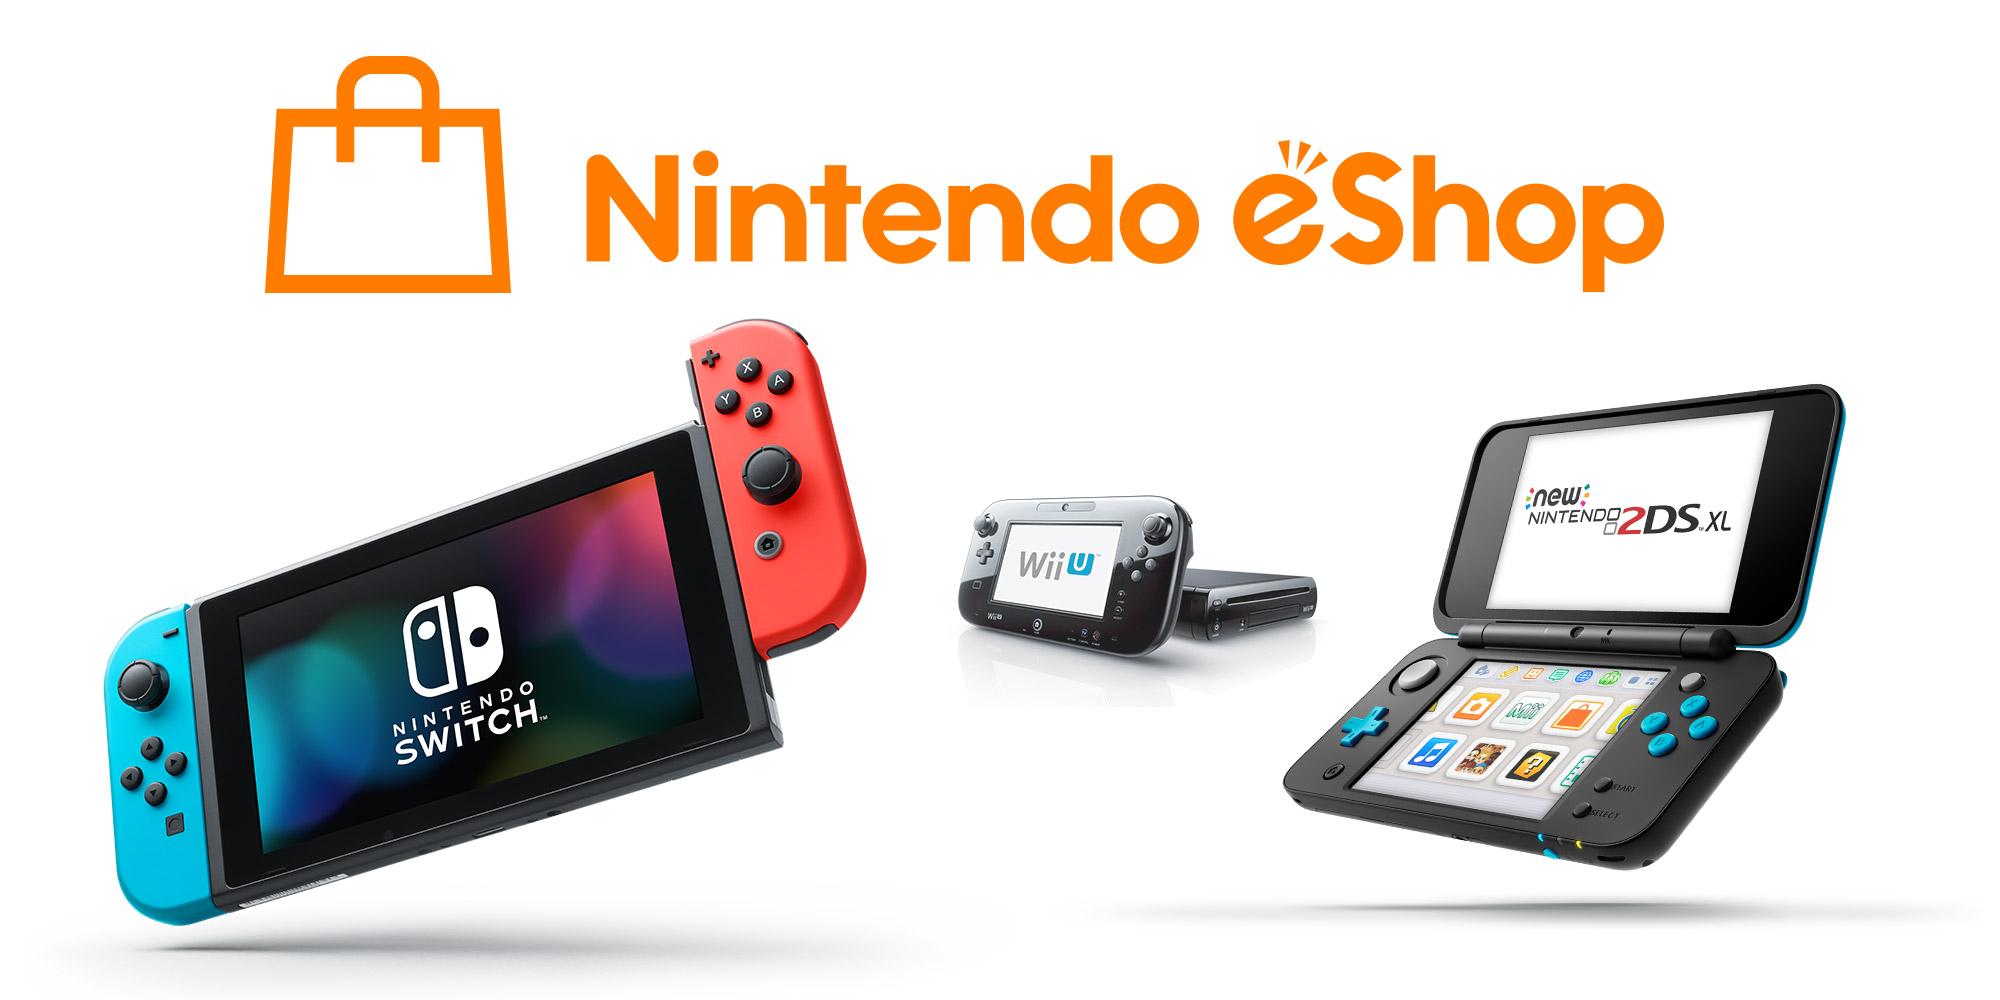 Gift Cards up to 20% off: Nintendo eShop $45, Krispy Kreme $23, Kansas City Steaks $80, more